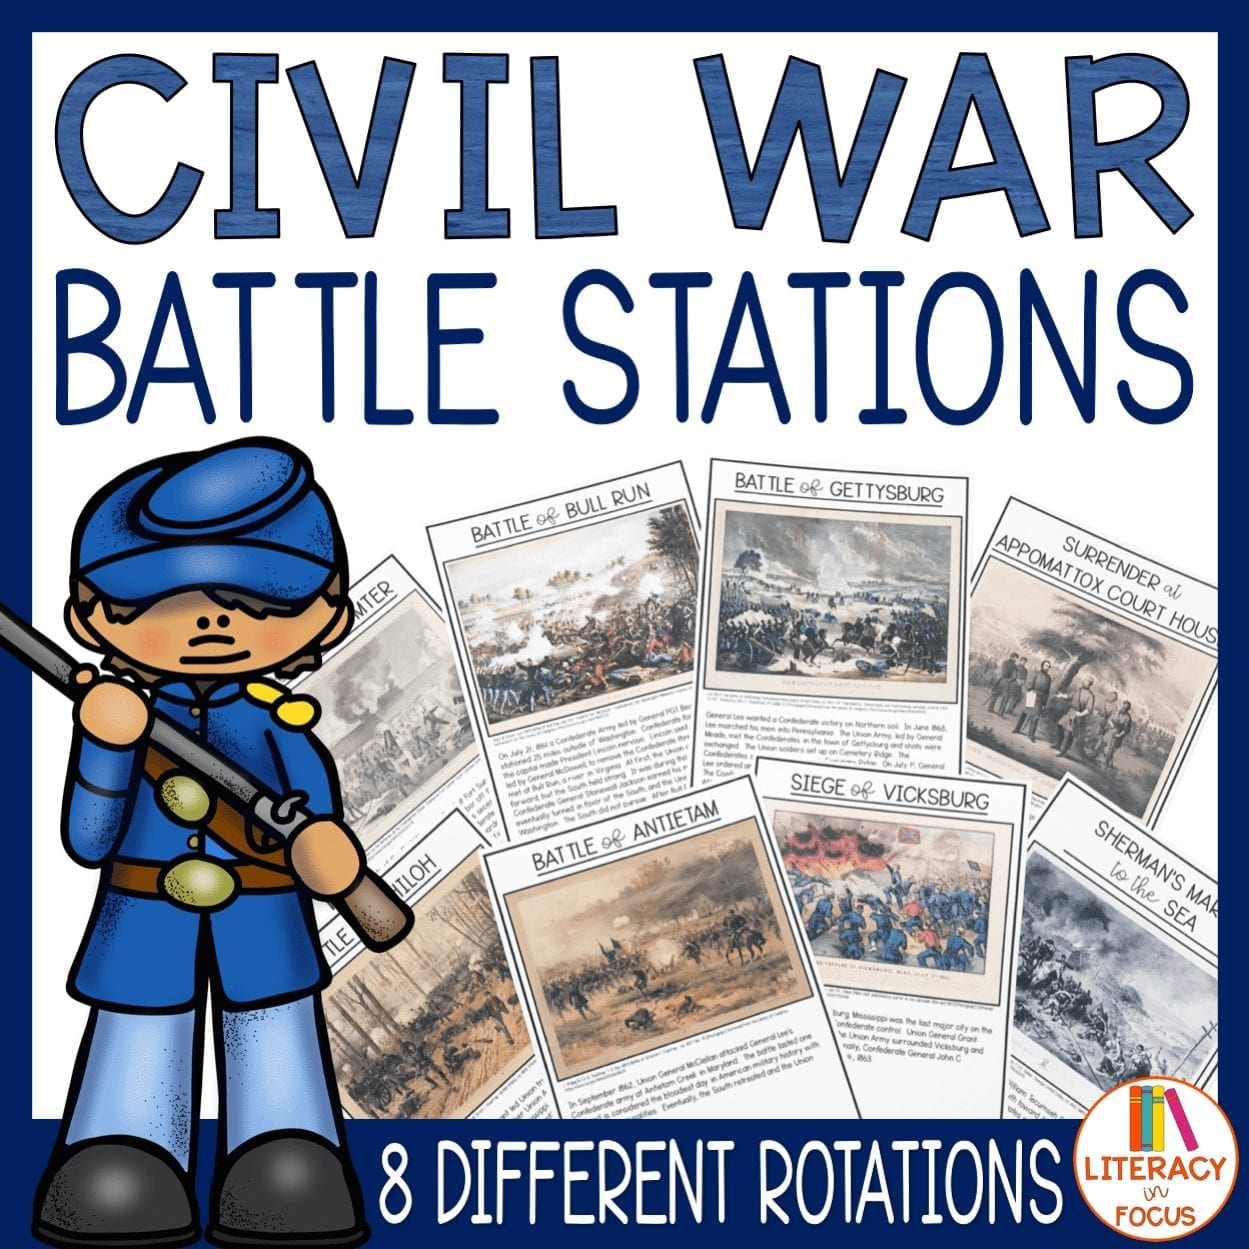 Civil War Battle Stations